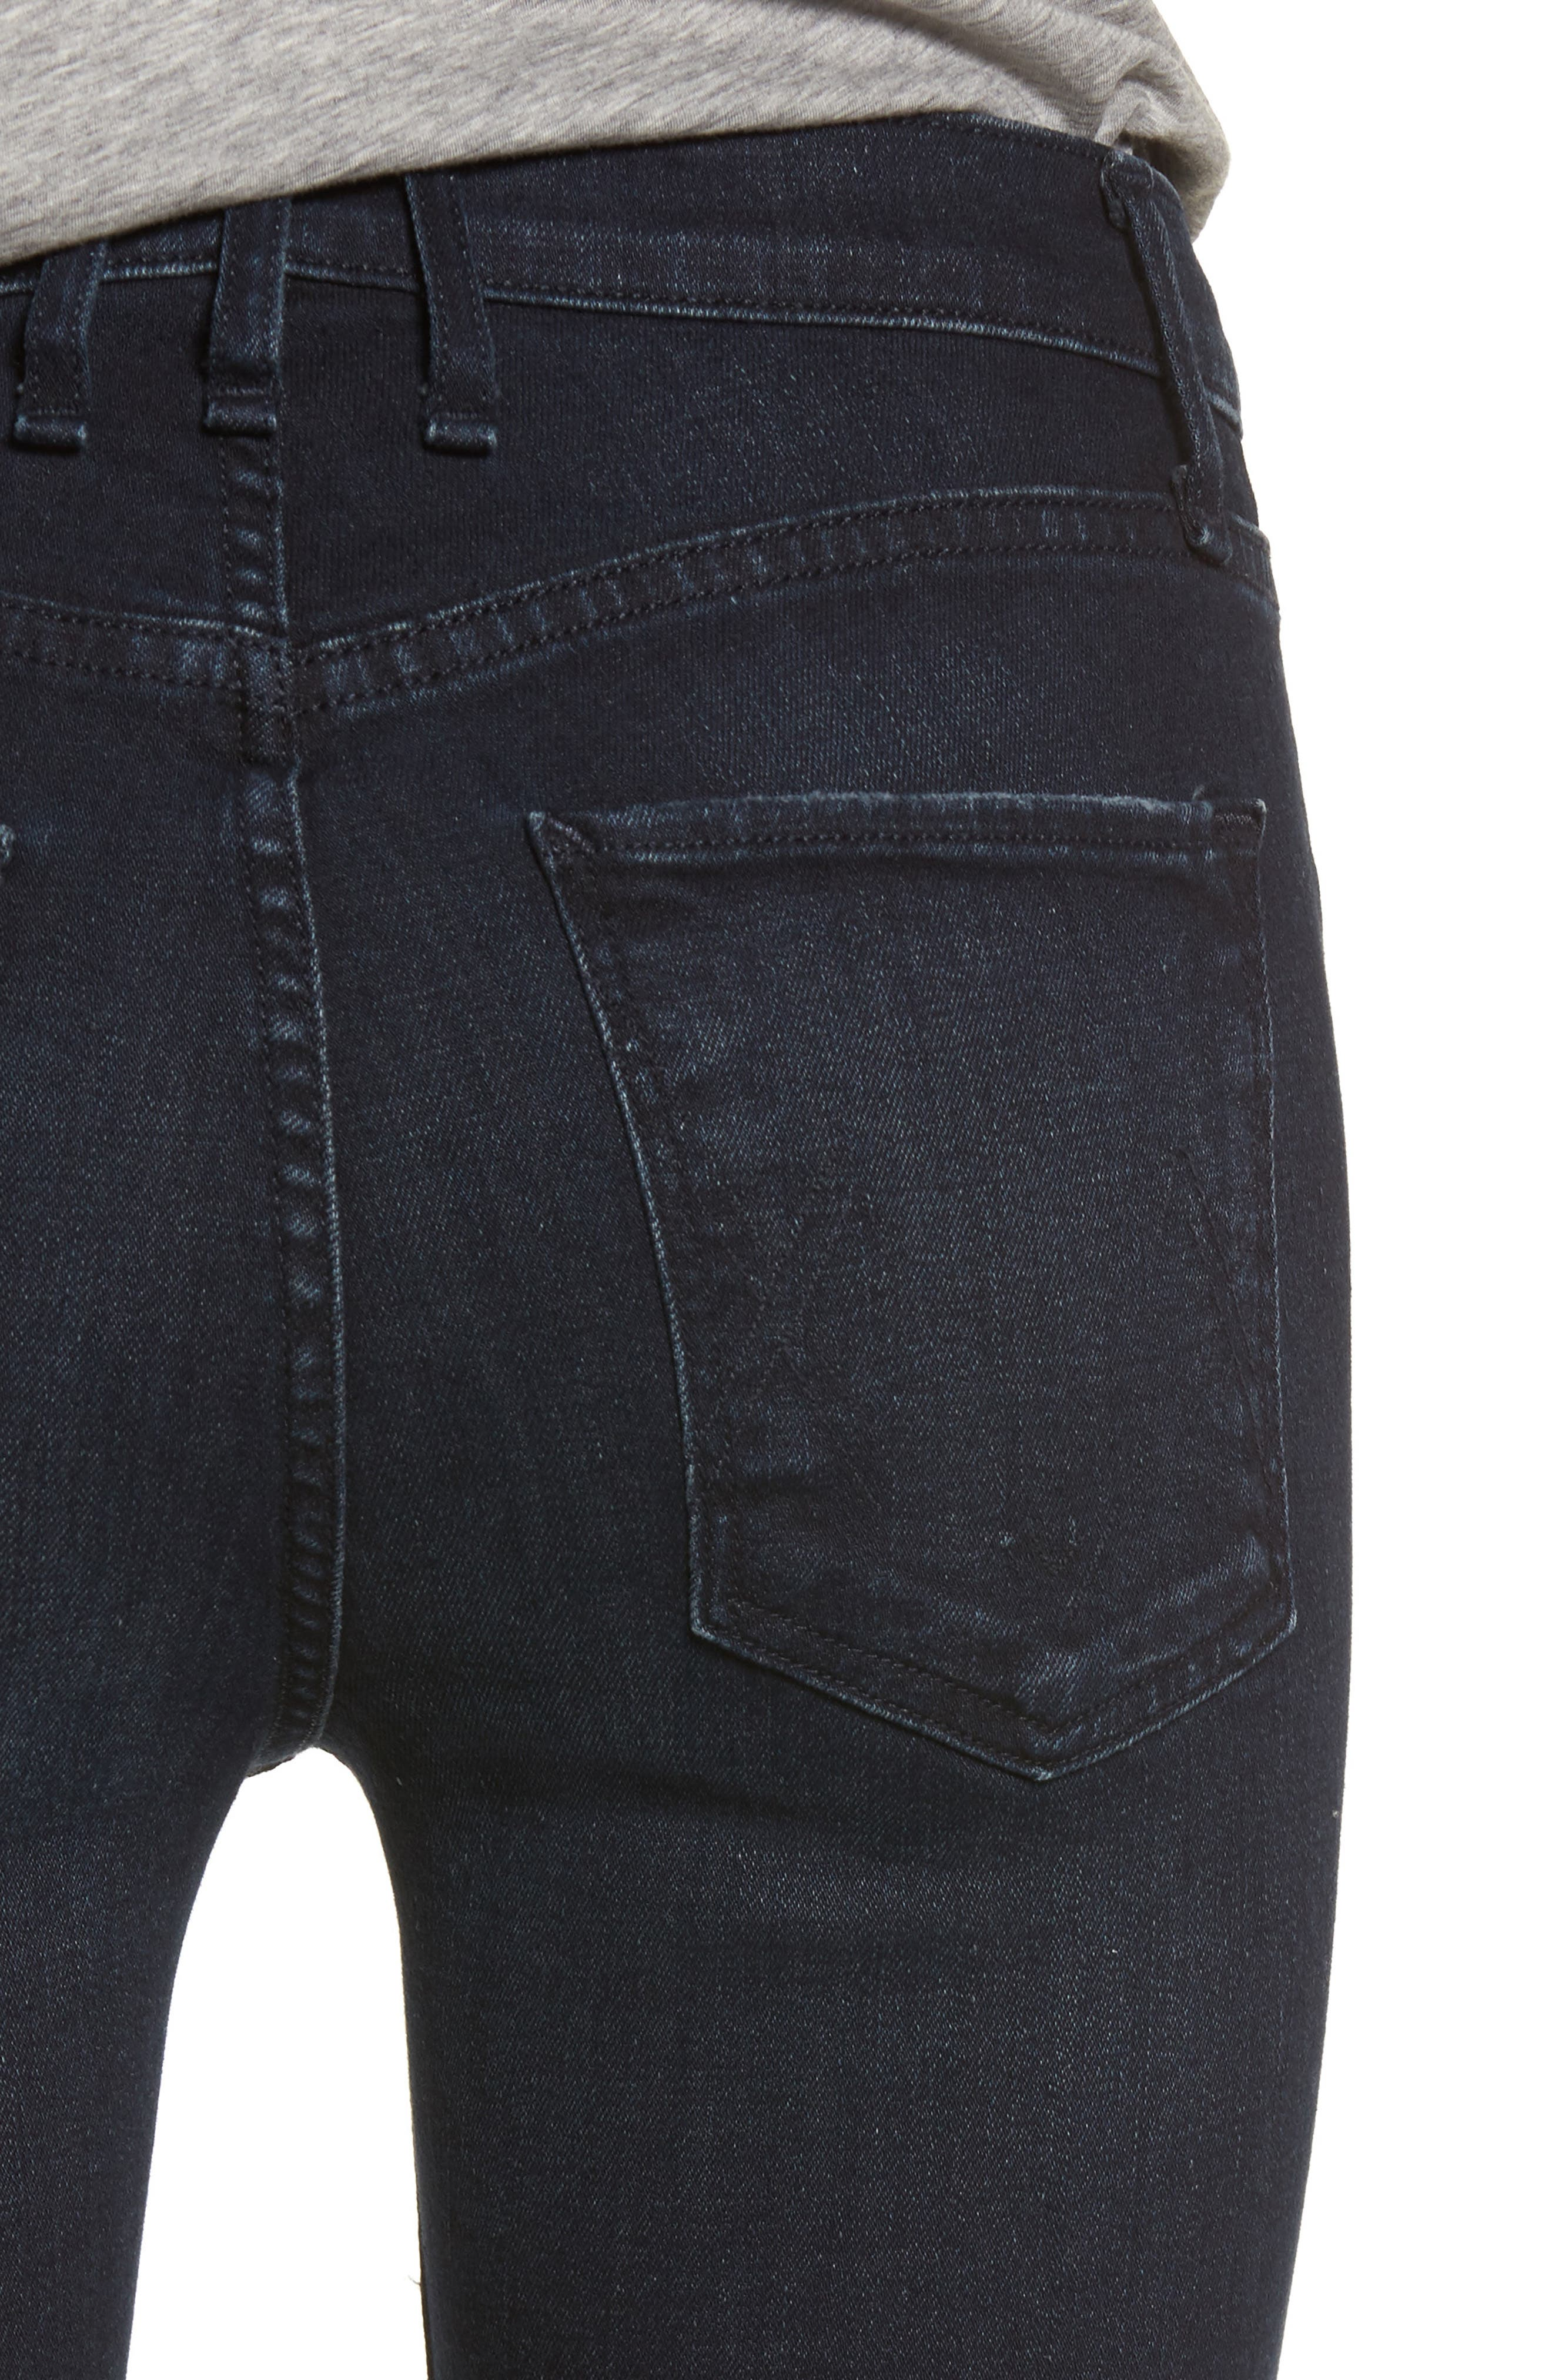 Alternate Image 4  - McGuire Gainsbourg Bootcut Jeans (Aja)